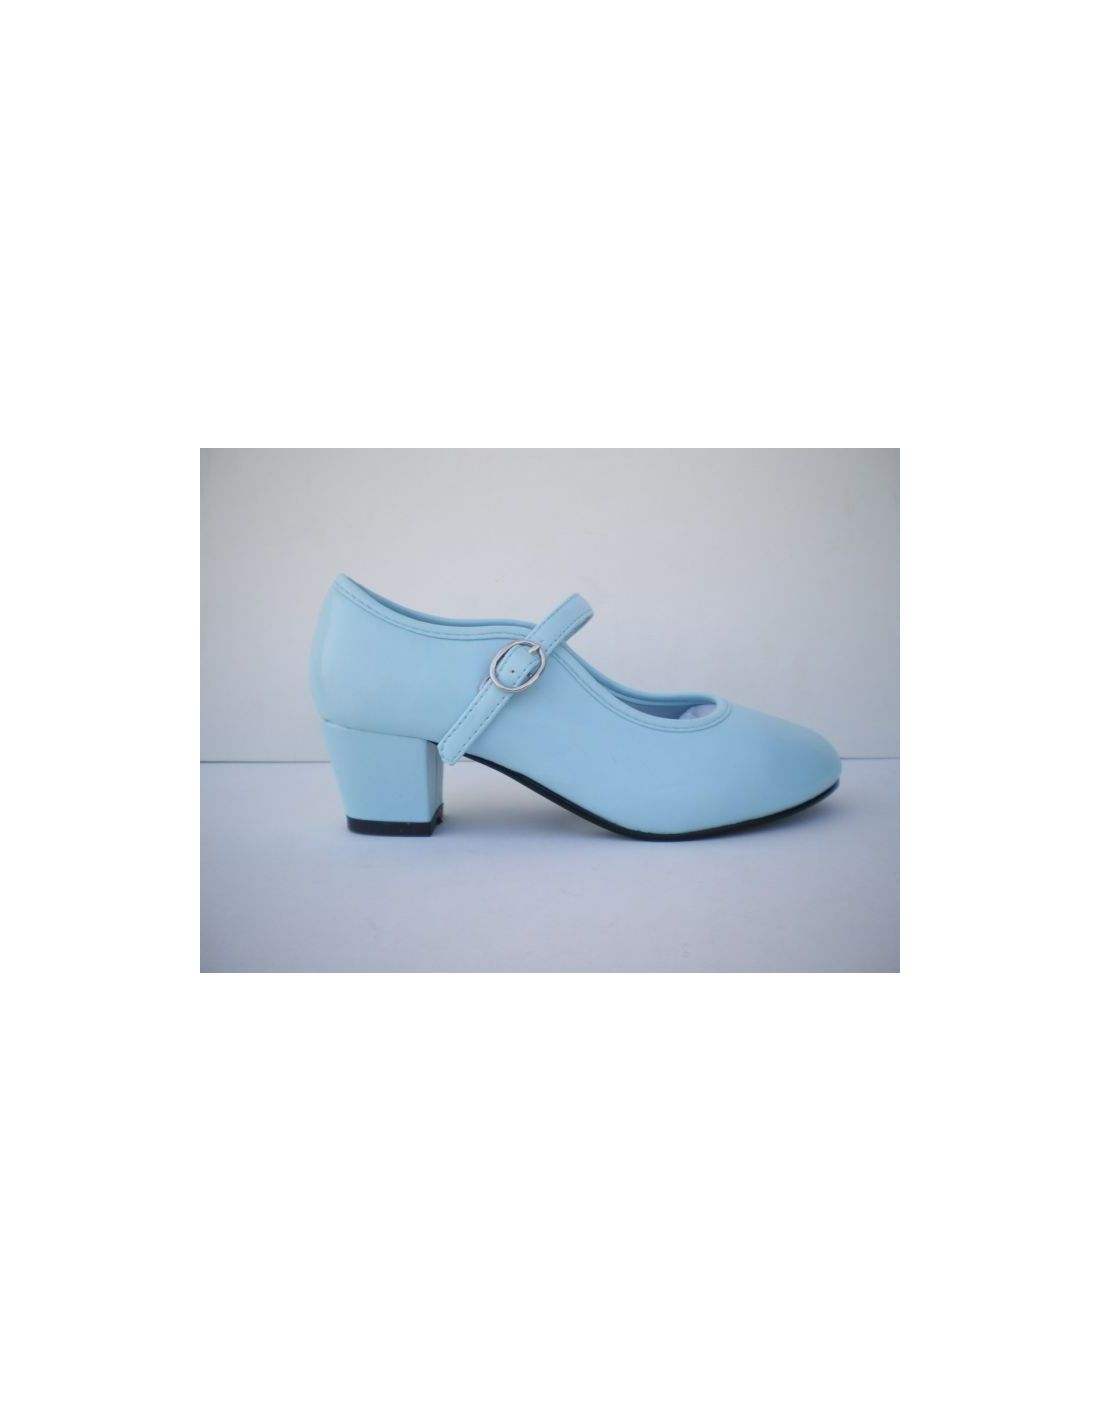 Chaussures Bleu Celeste Enfants IDBlIKse